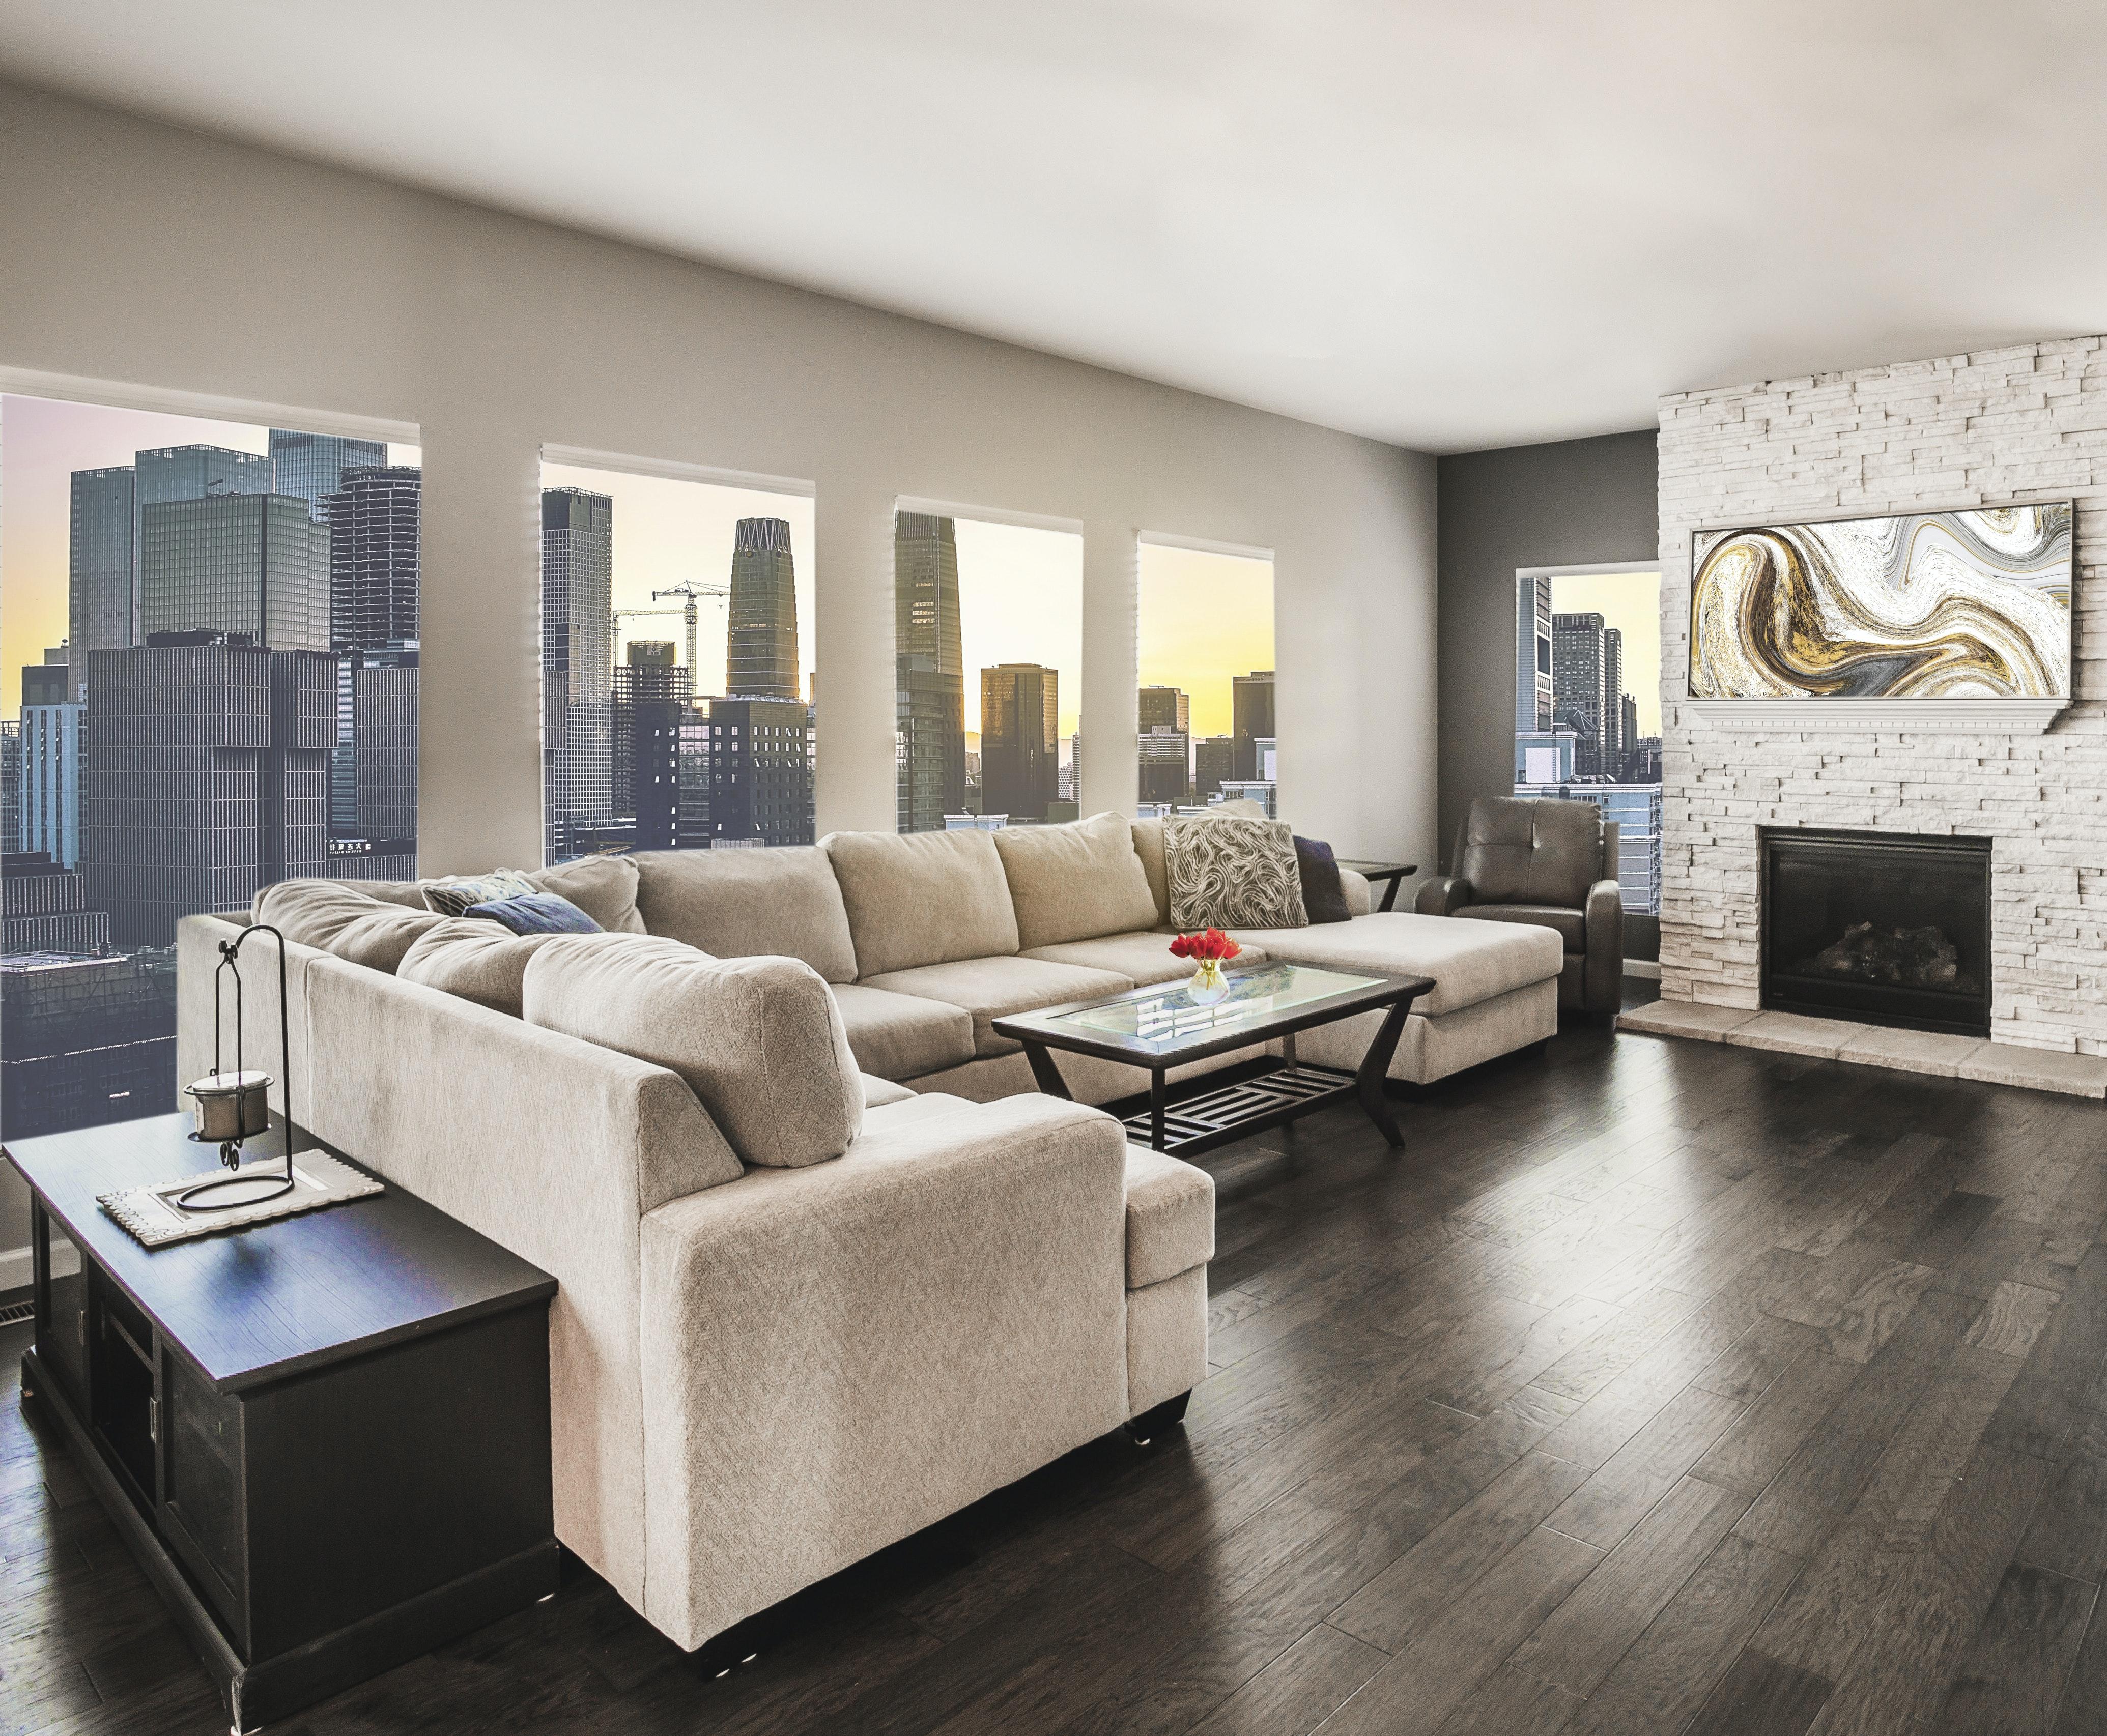 Incroyable 1000+ Beautiful Living Room Photos · Pexels · Free Stock Photos